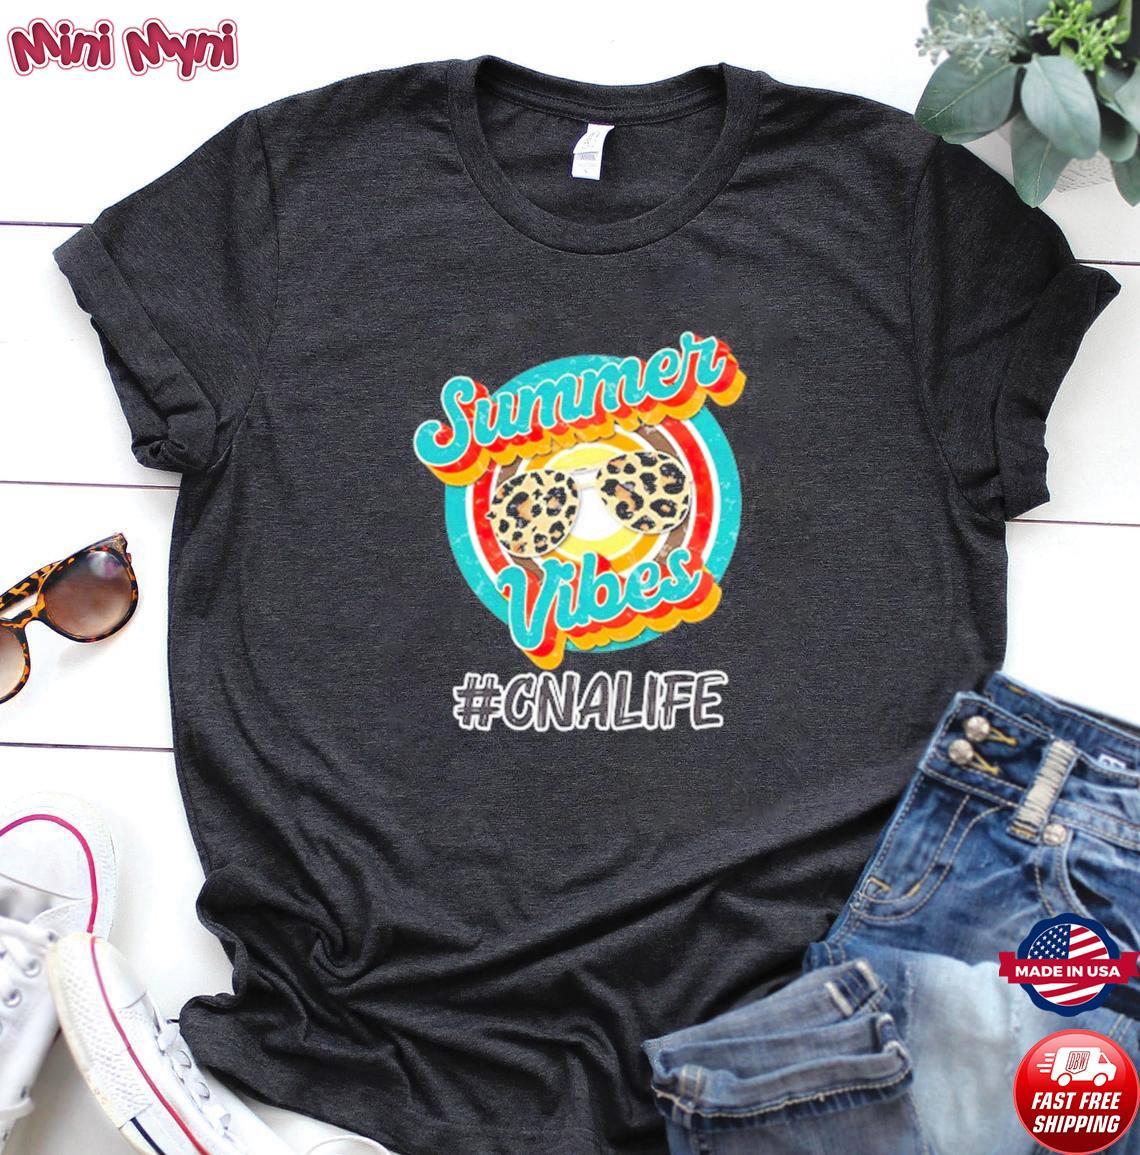 Vintage Summer Vibes CNA Life Shirt